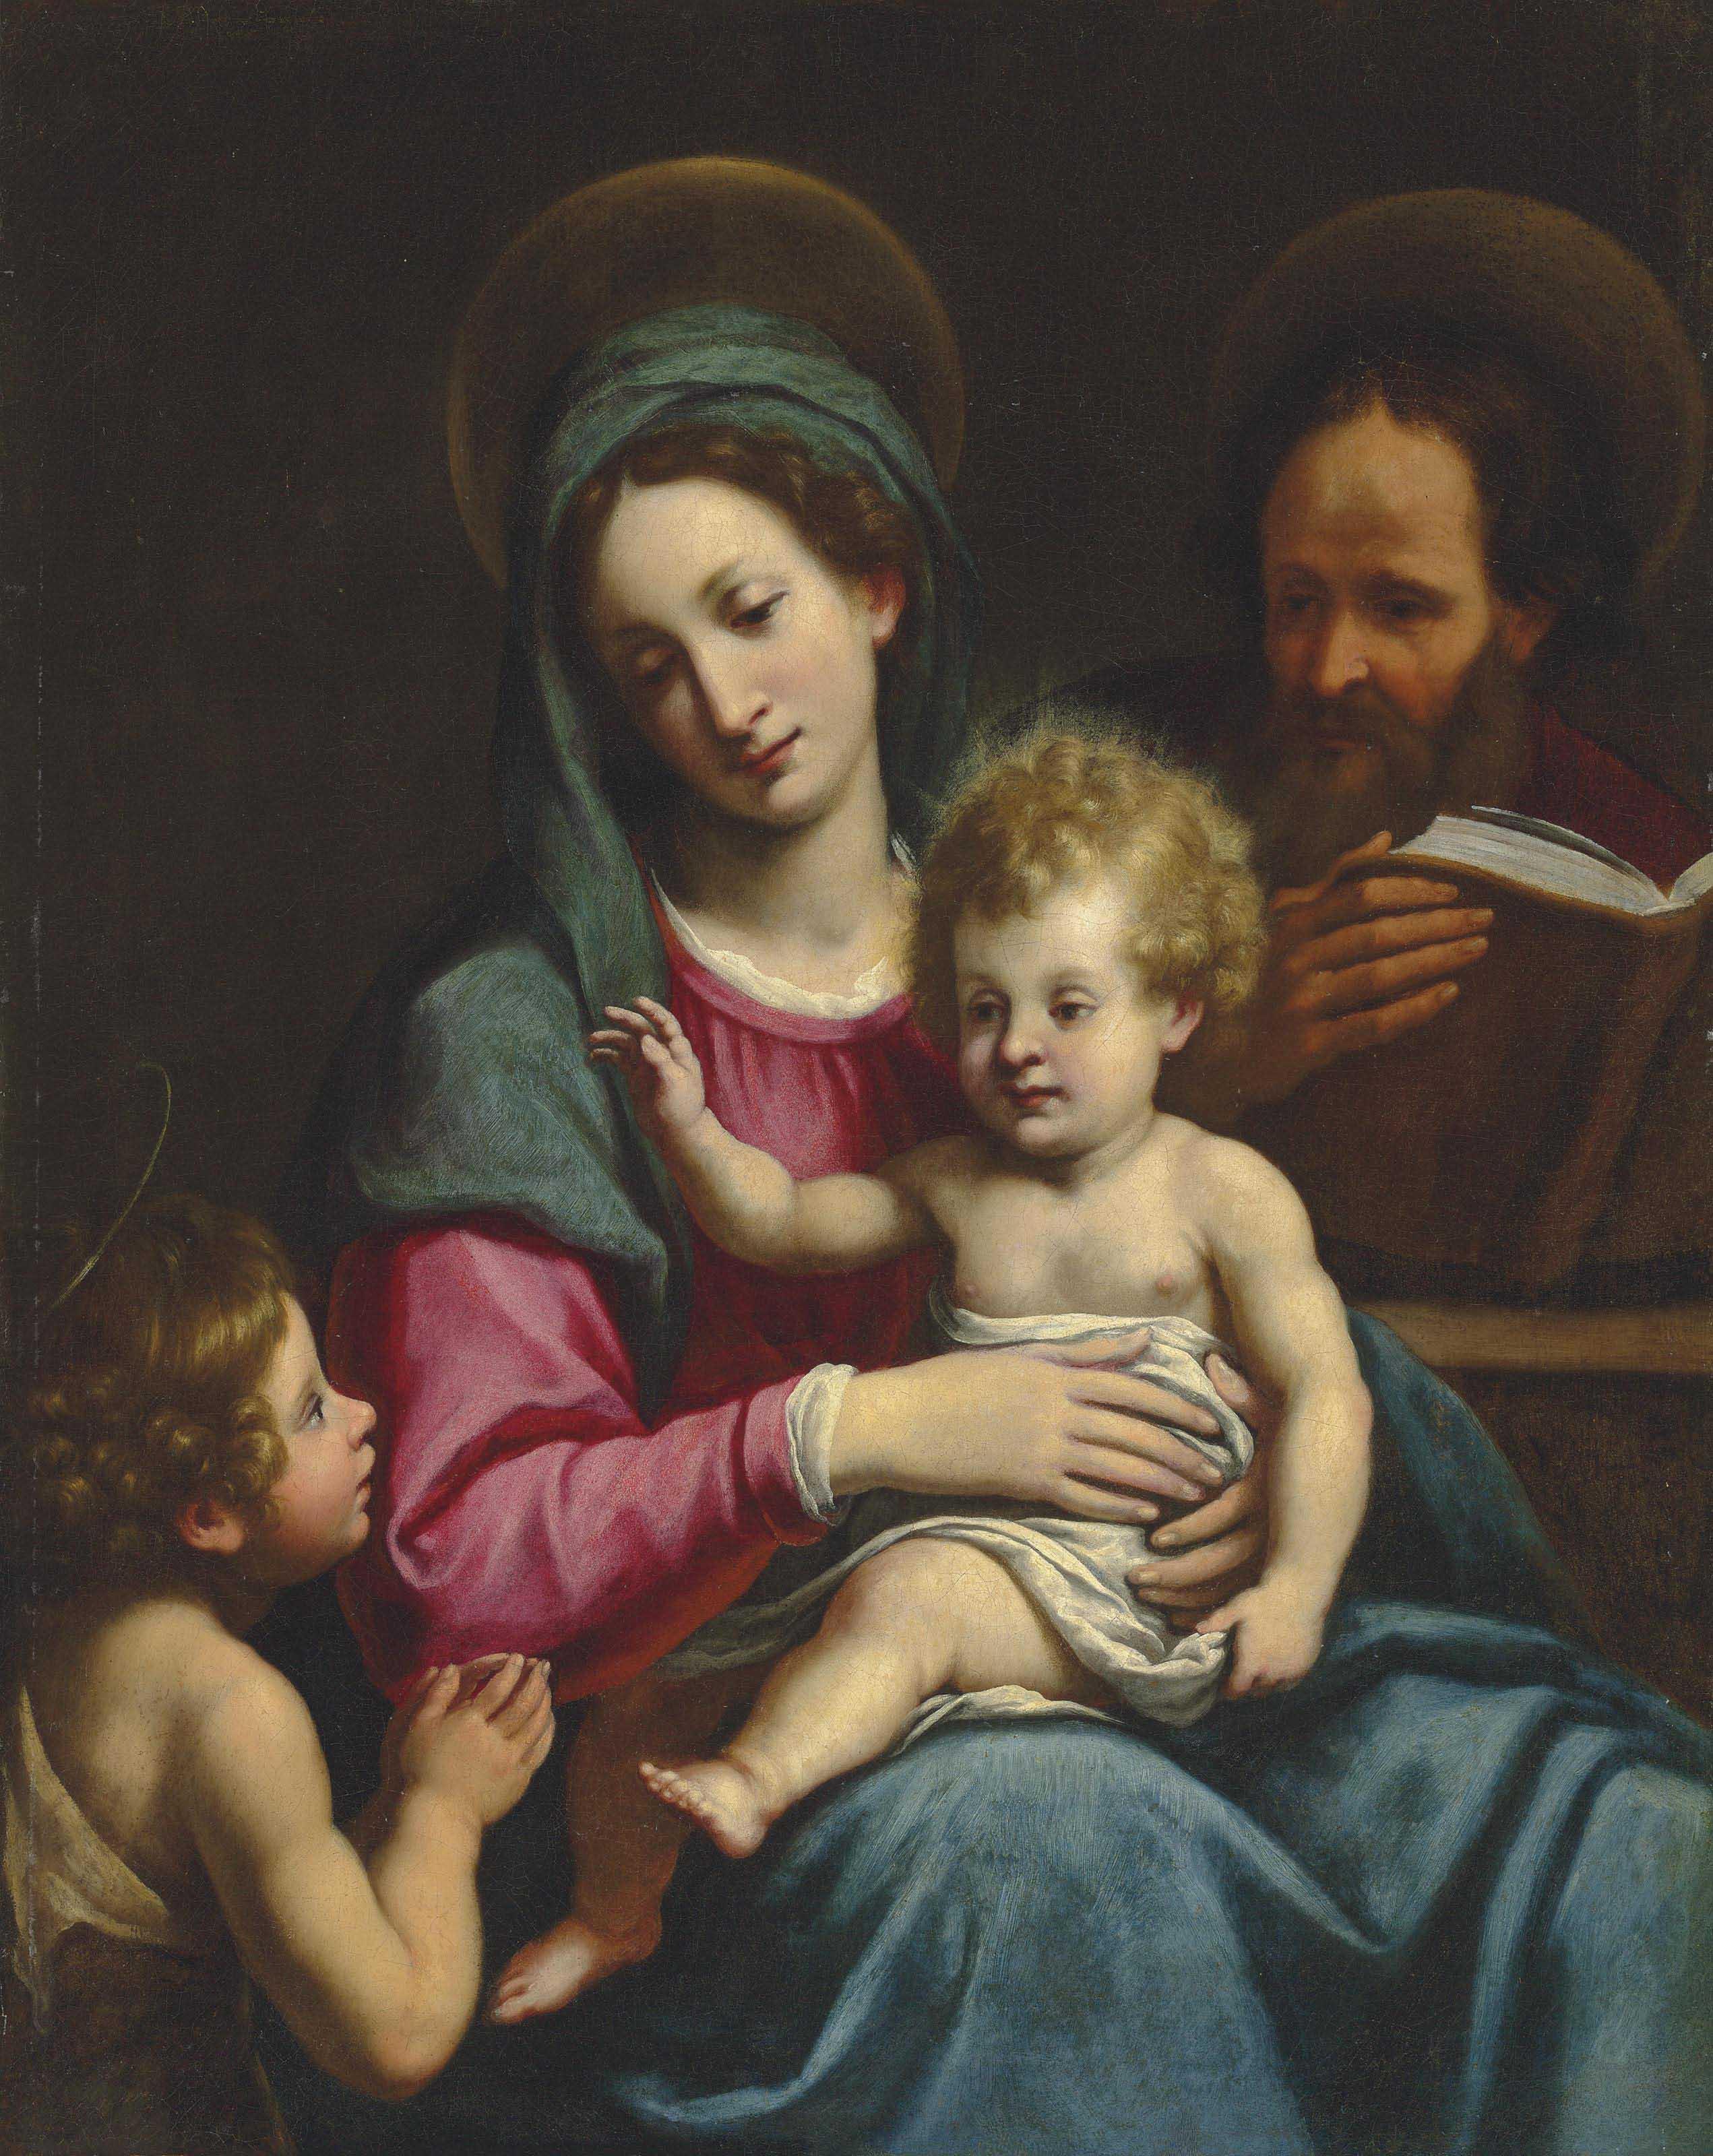 Matteo Rosselli (Florence 1578